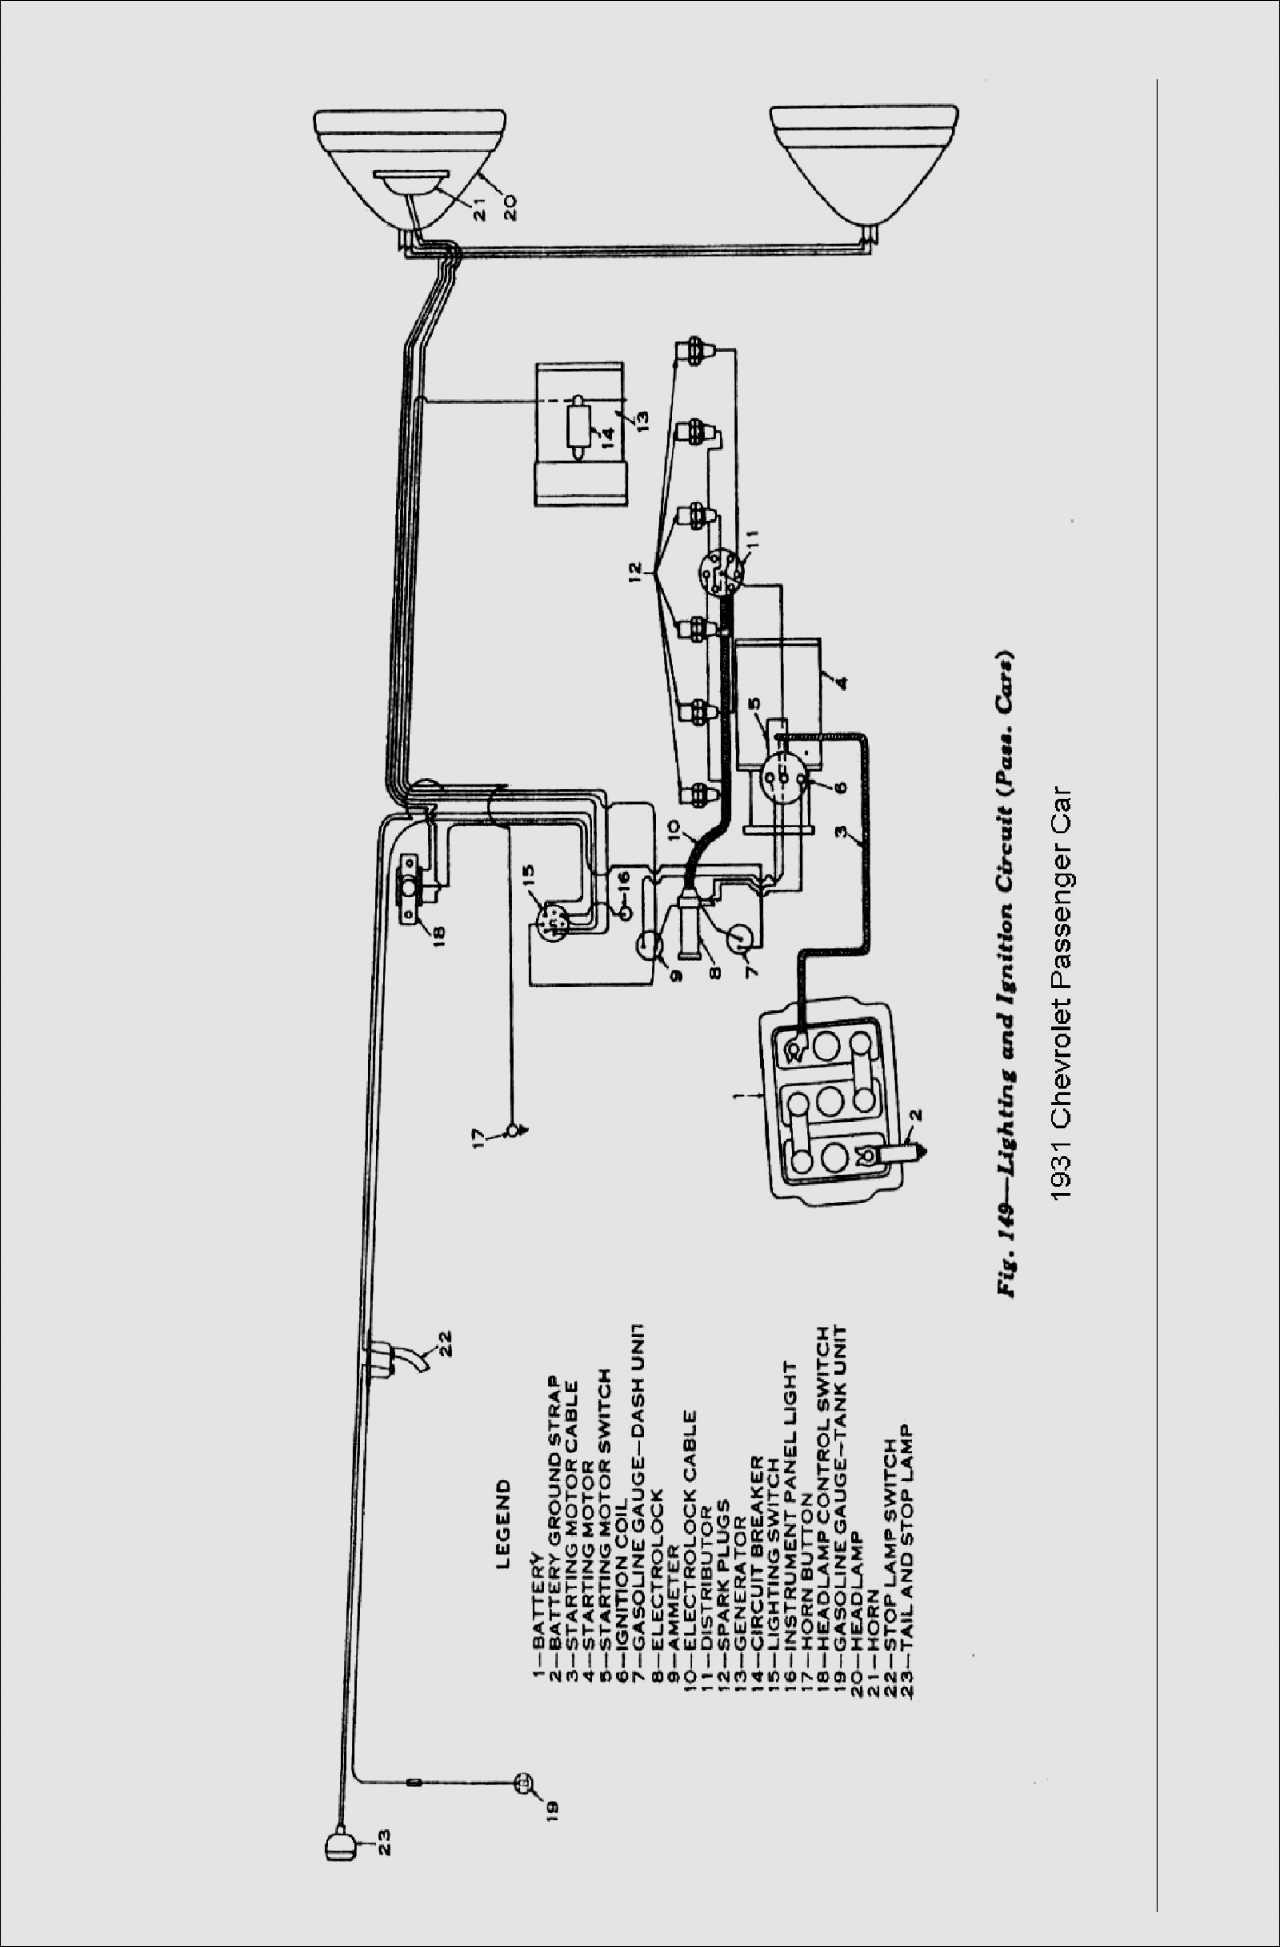 Train Horn Wiring Diagram